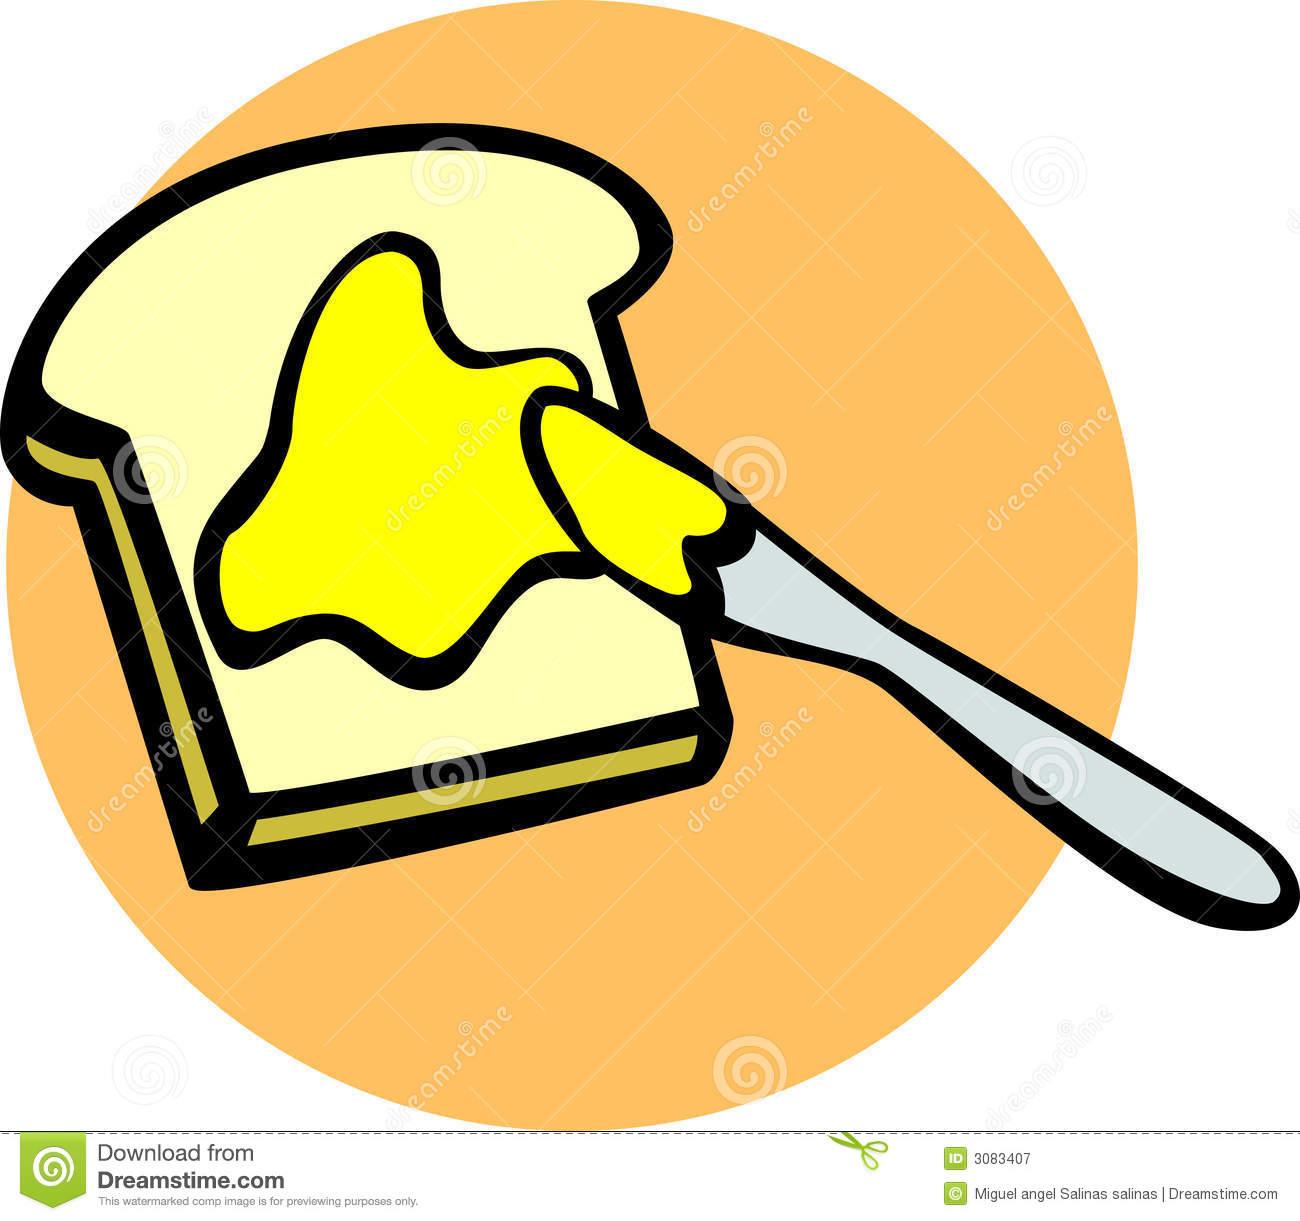 Butter Clip Art | Clipart Panda - Free Clipart Images